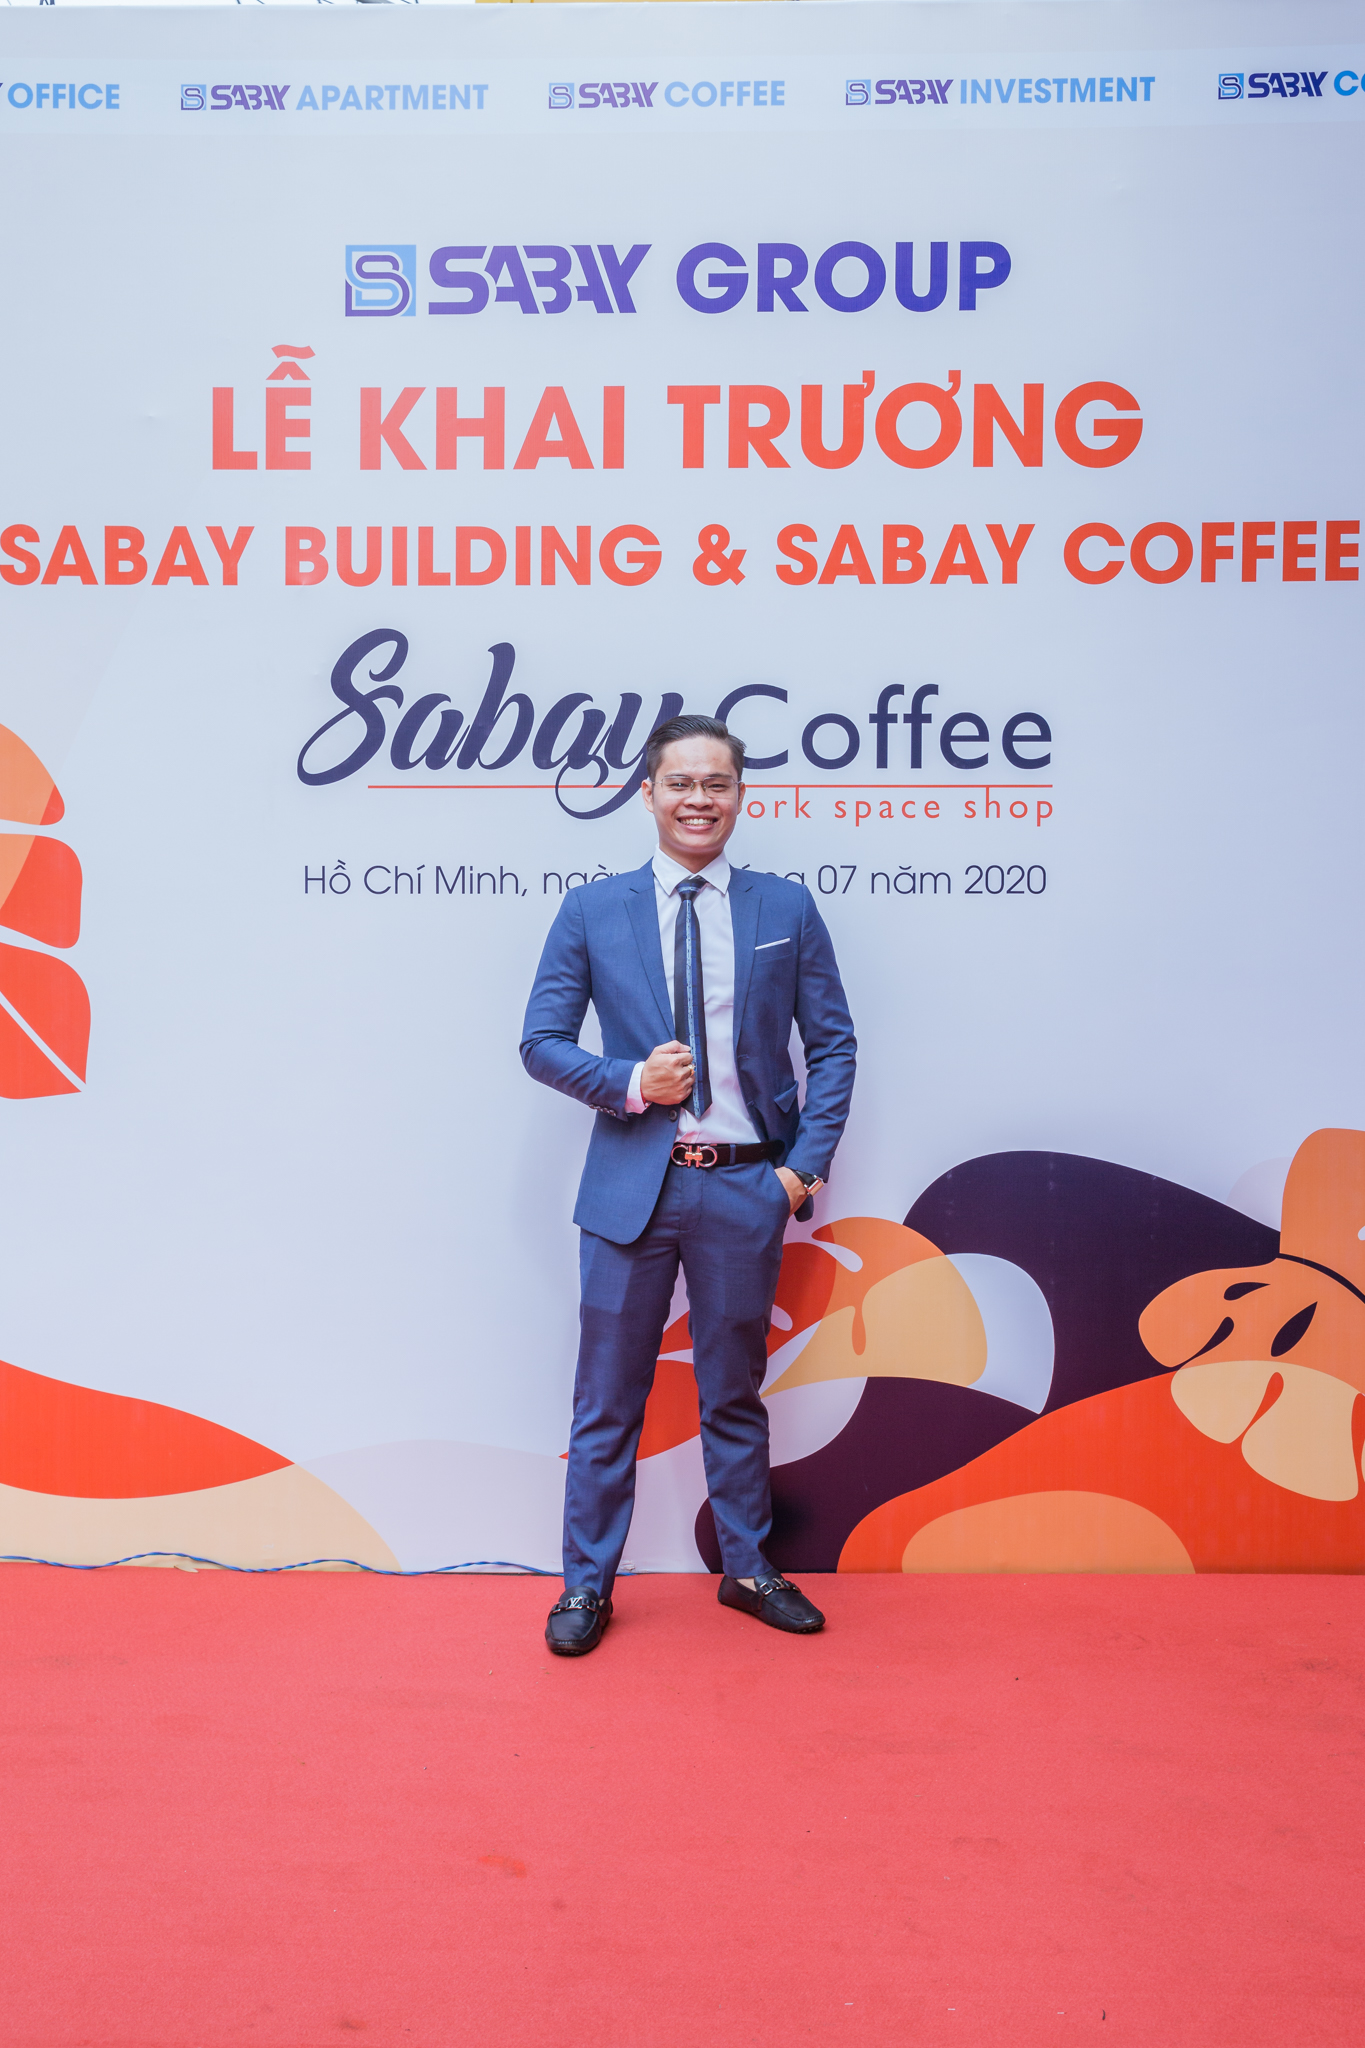 khai truong sabay coffee